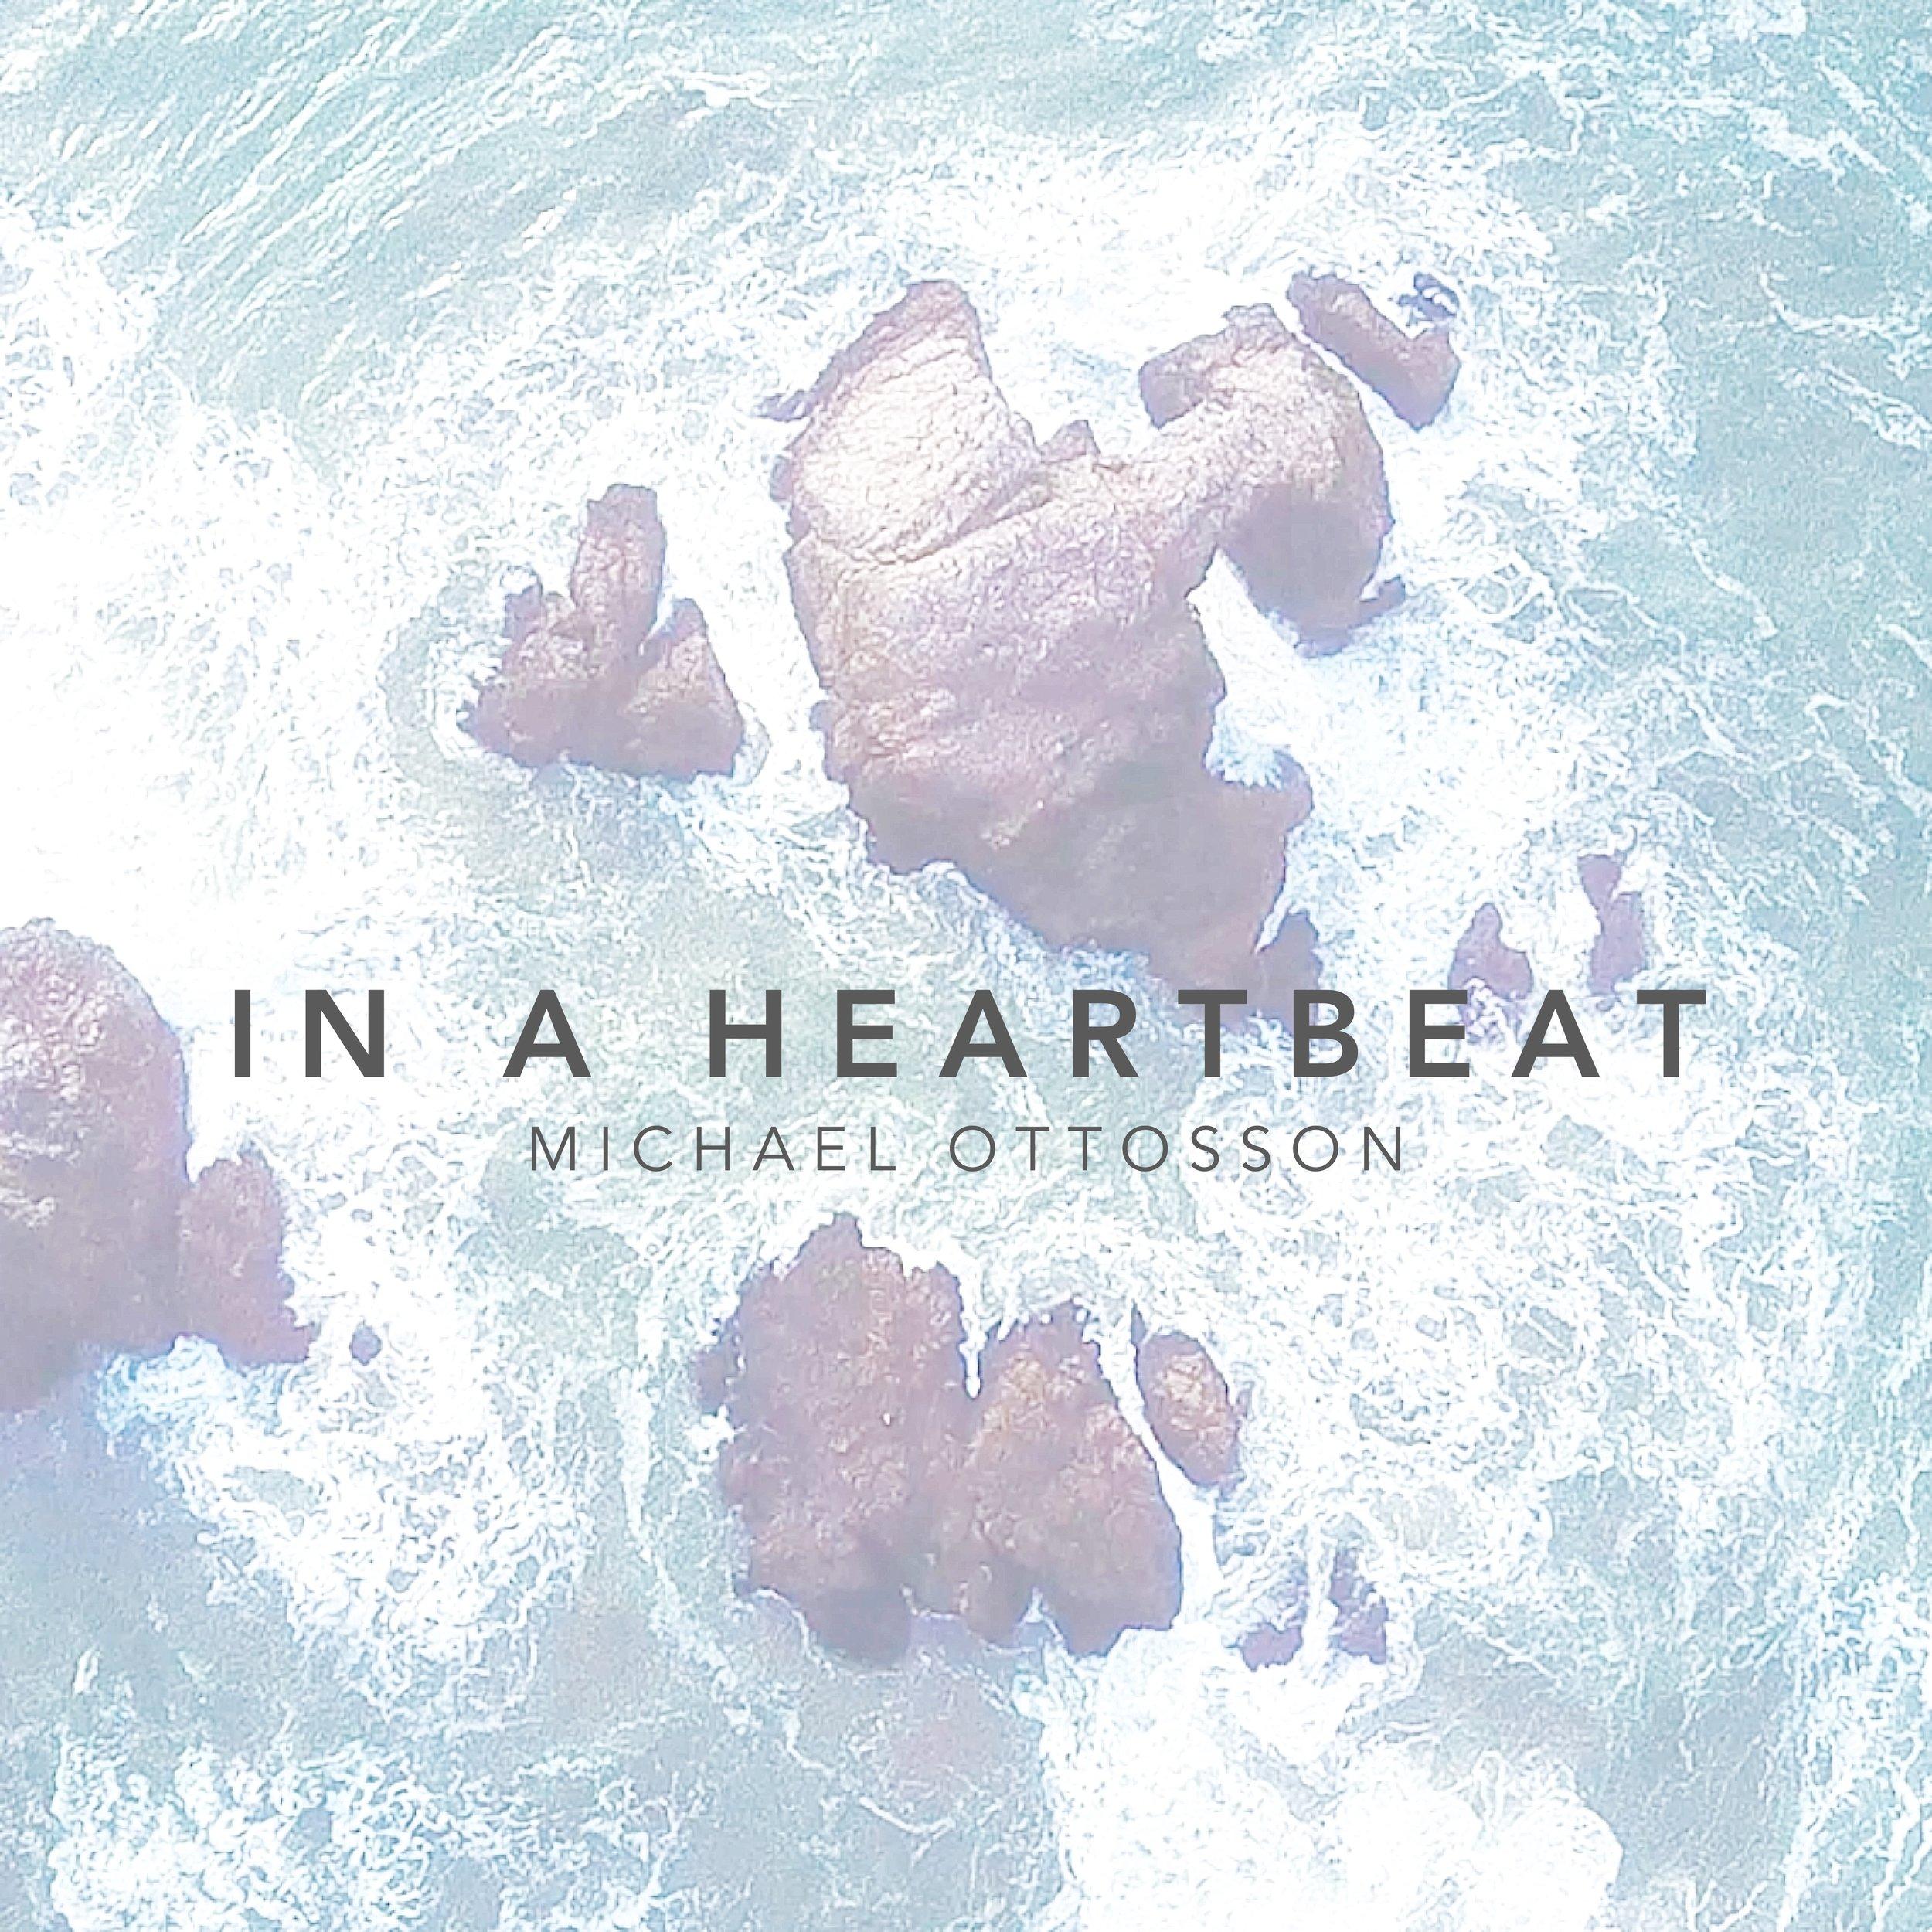 In a heartbeat - Album cover 3.jpg